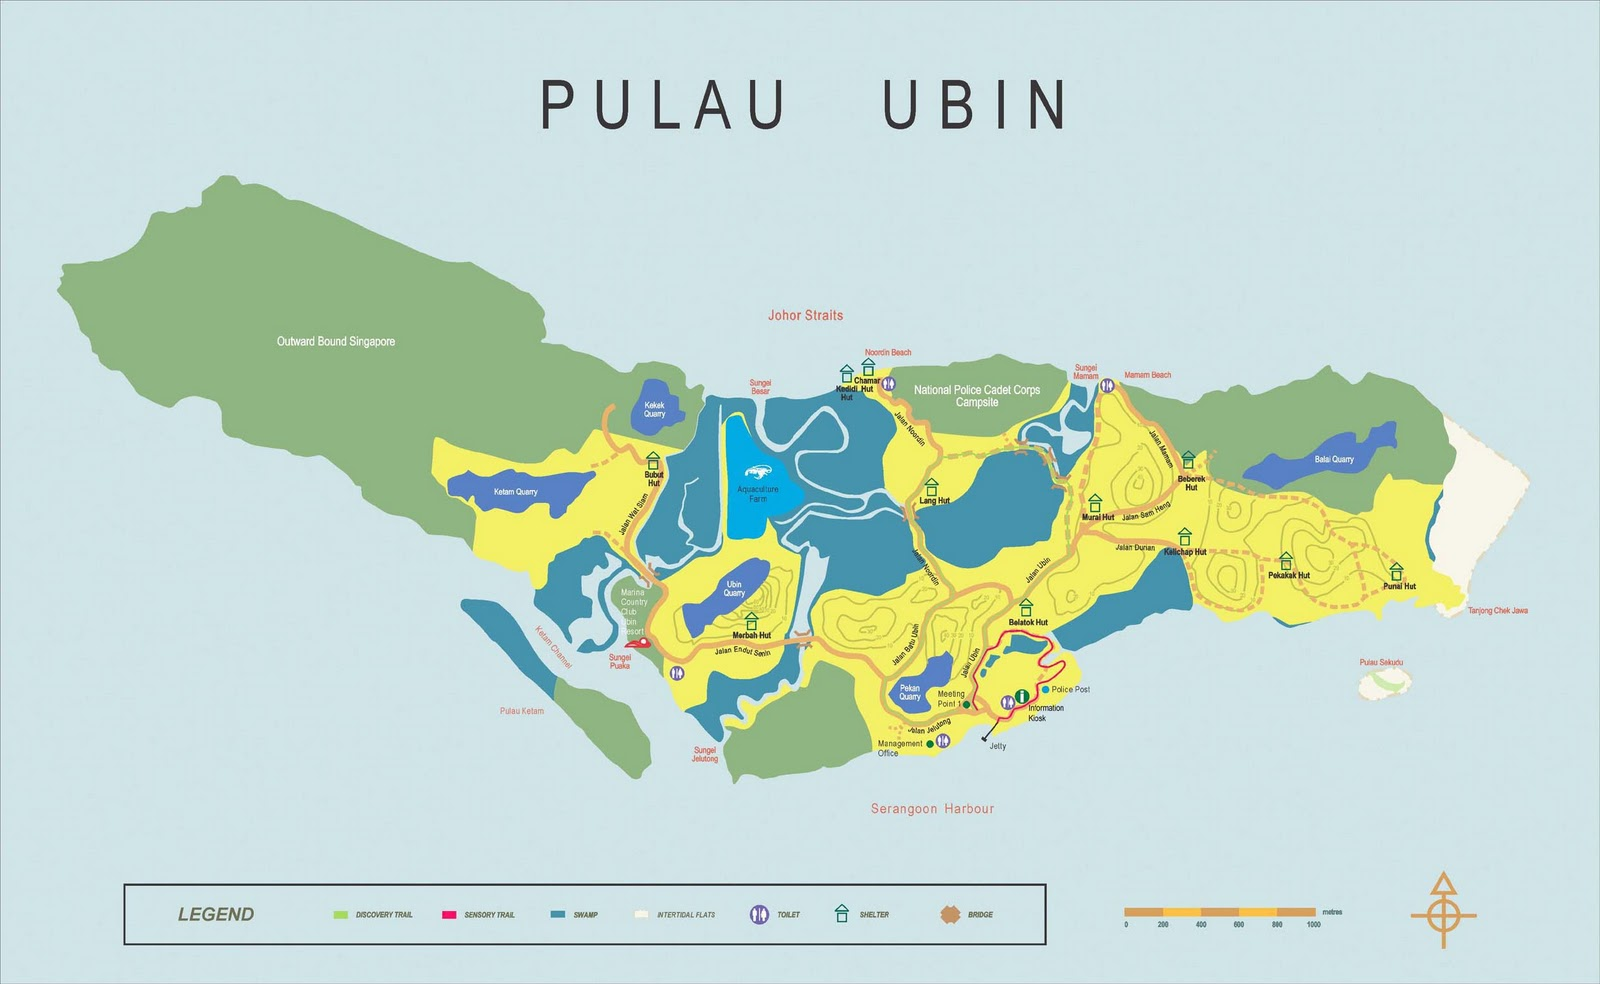 Coral Pattern Pulau Ubin Ubin Island